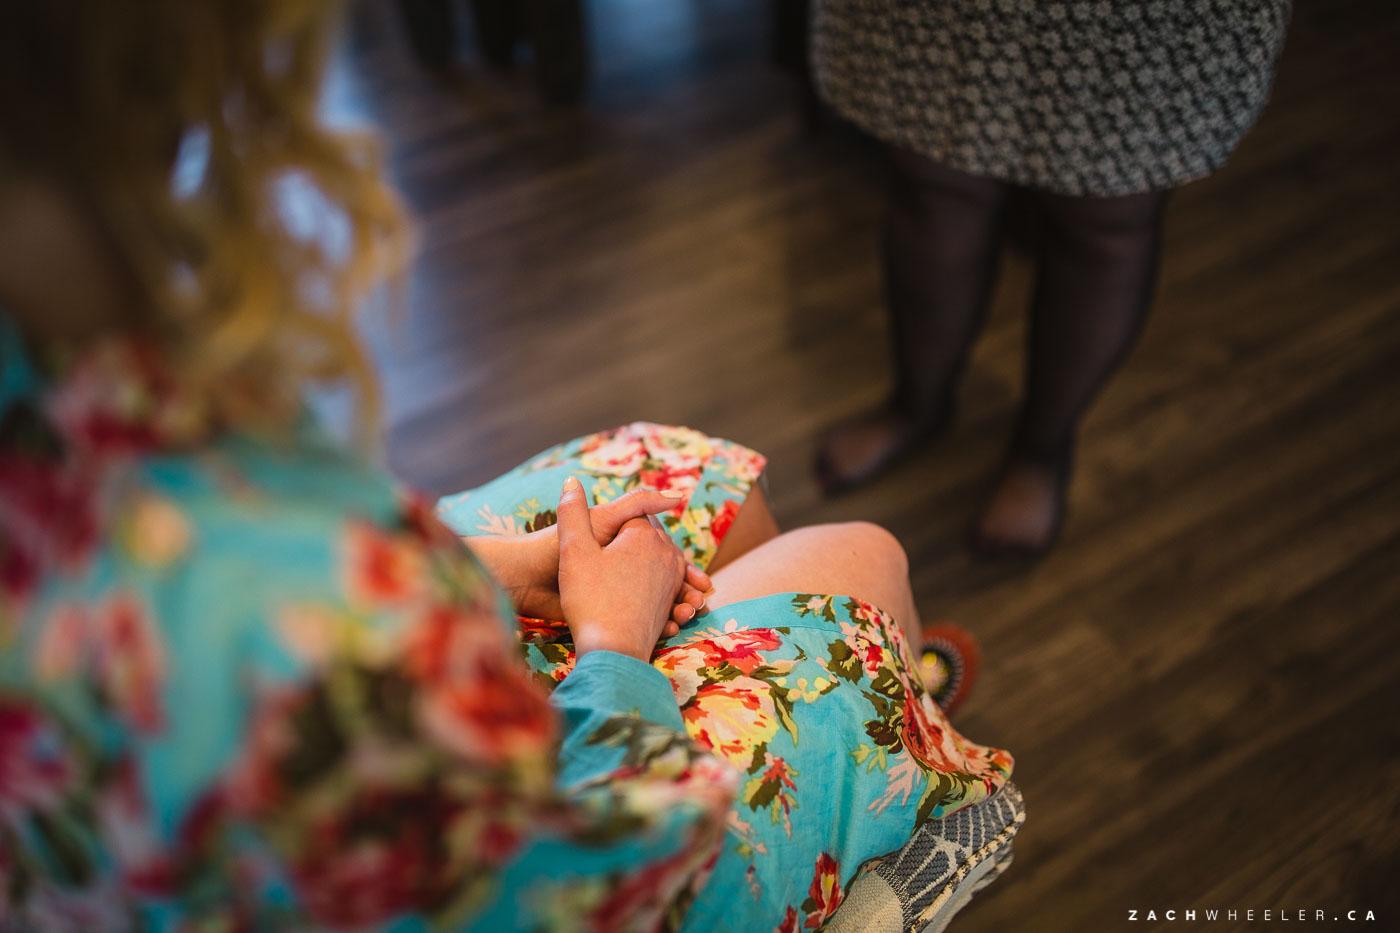 Sarah-Grant-Lesters-Fram-Wedding-12